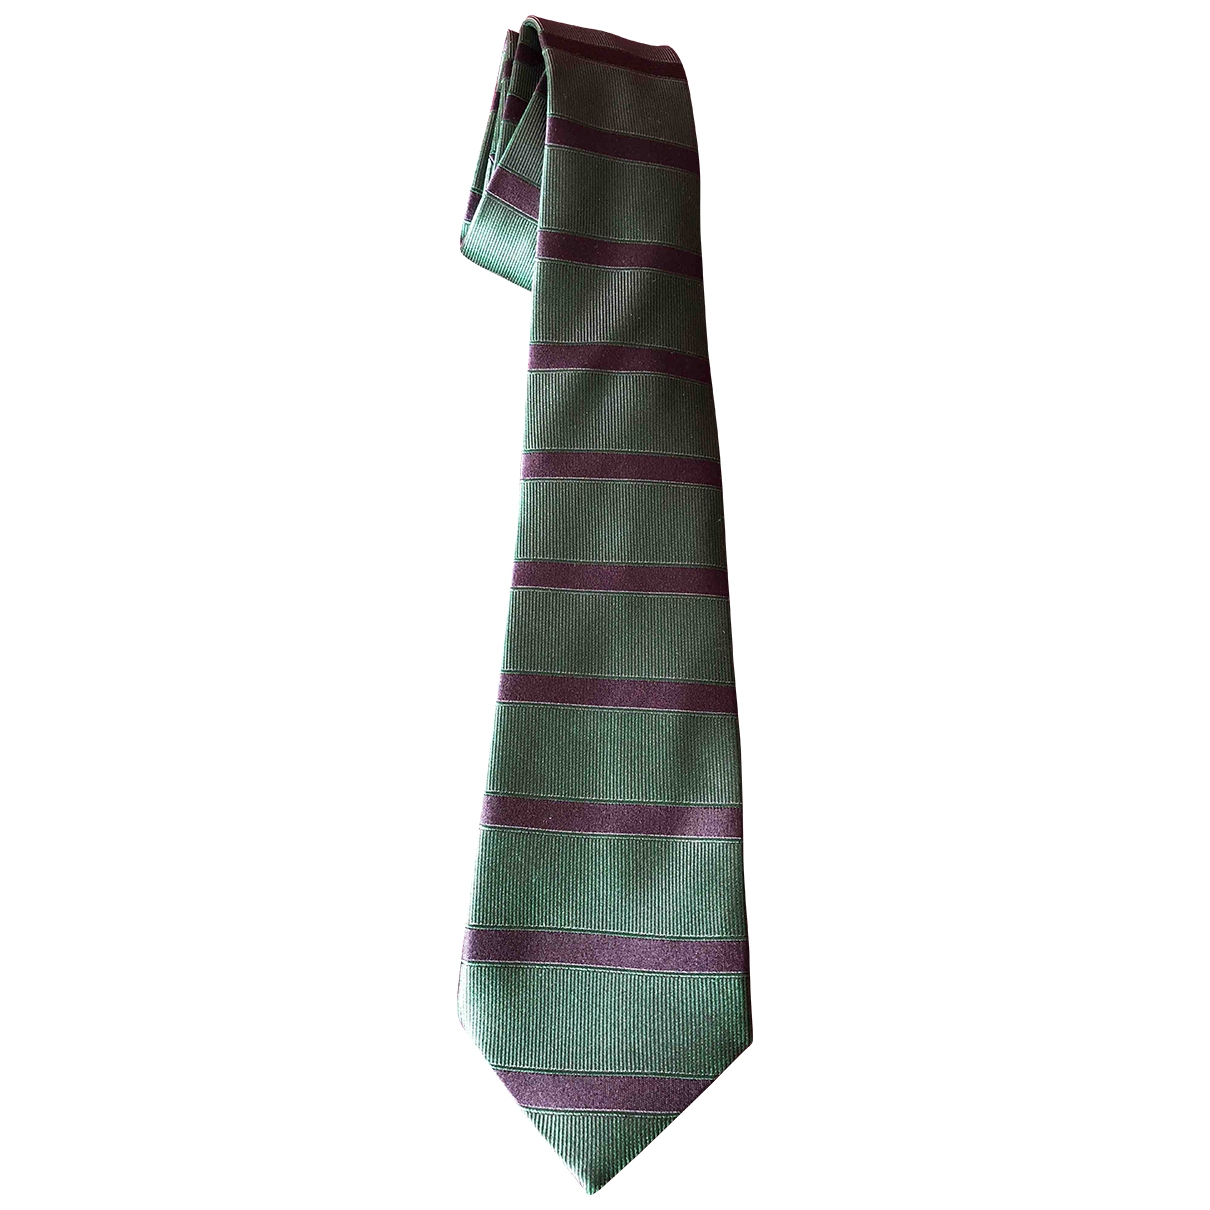 Carolina Herrera - Cravates   pour homme en soie - multicolore